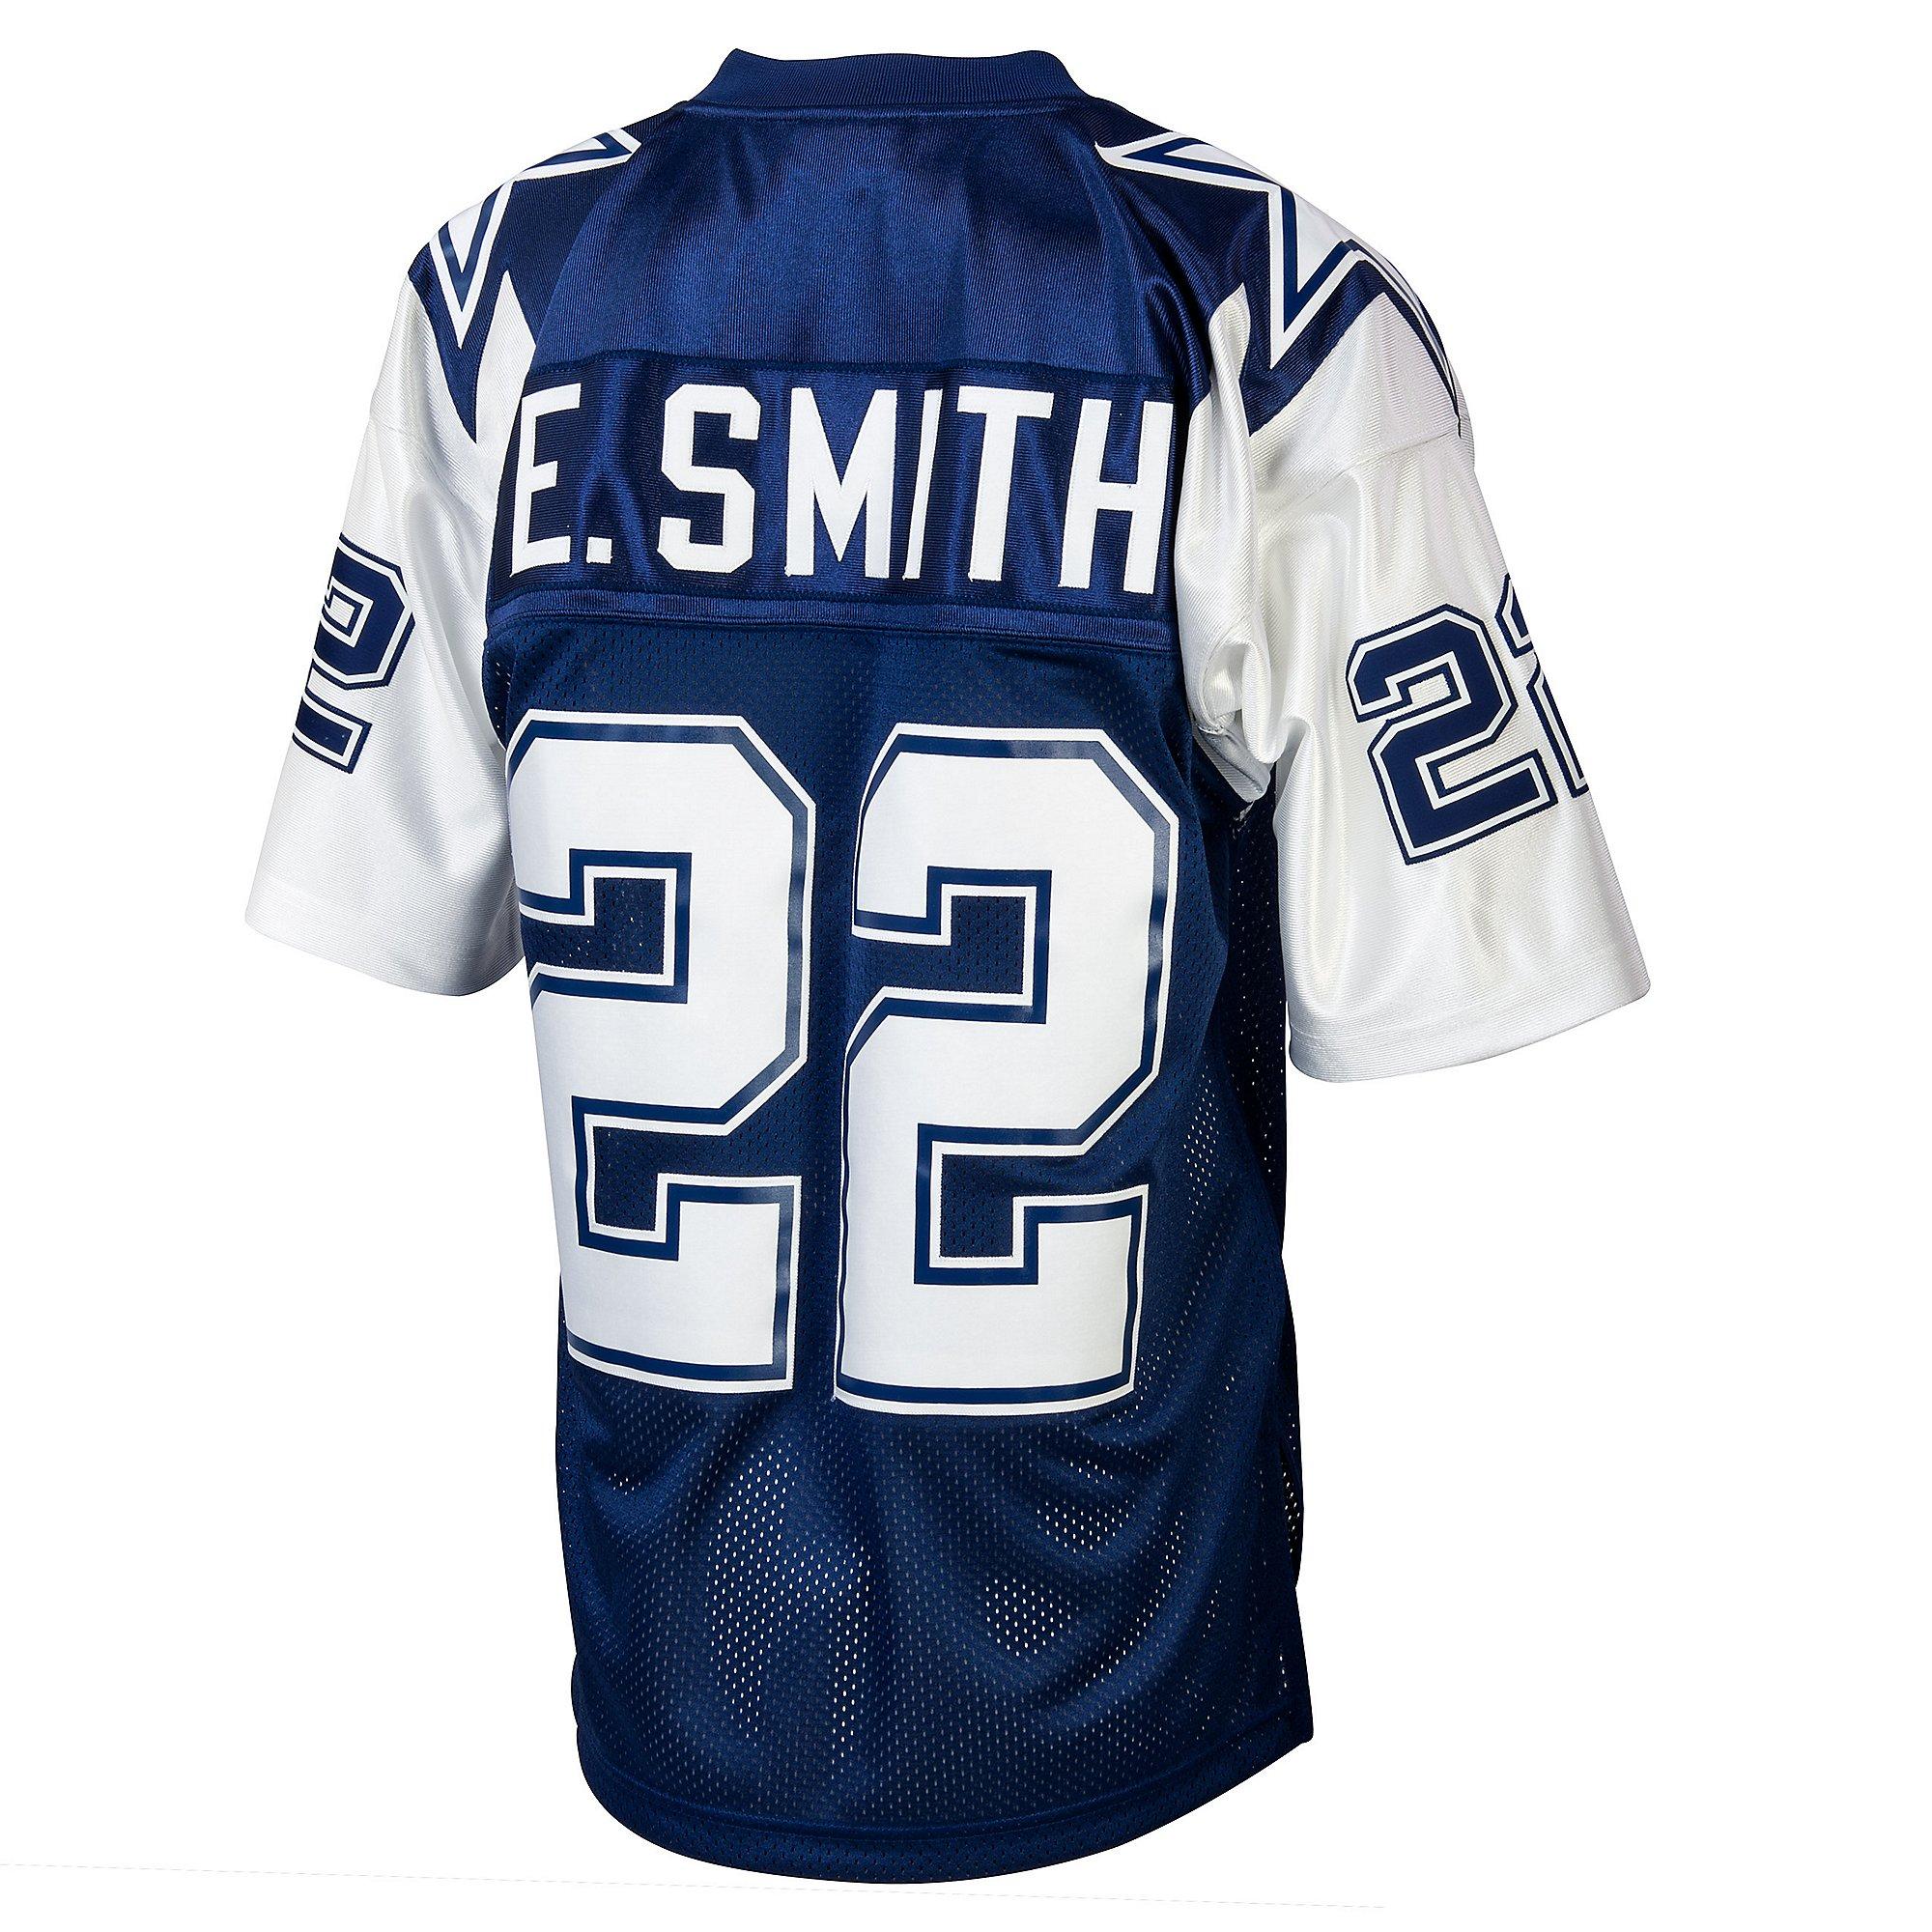 Dallas Cowboys Emmitt Smith 1995 Mitchell & Ness Double Star Jersey